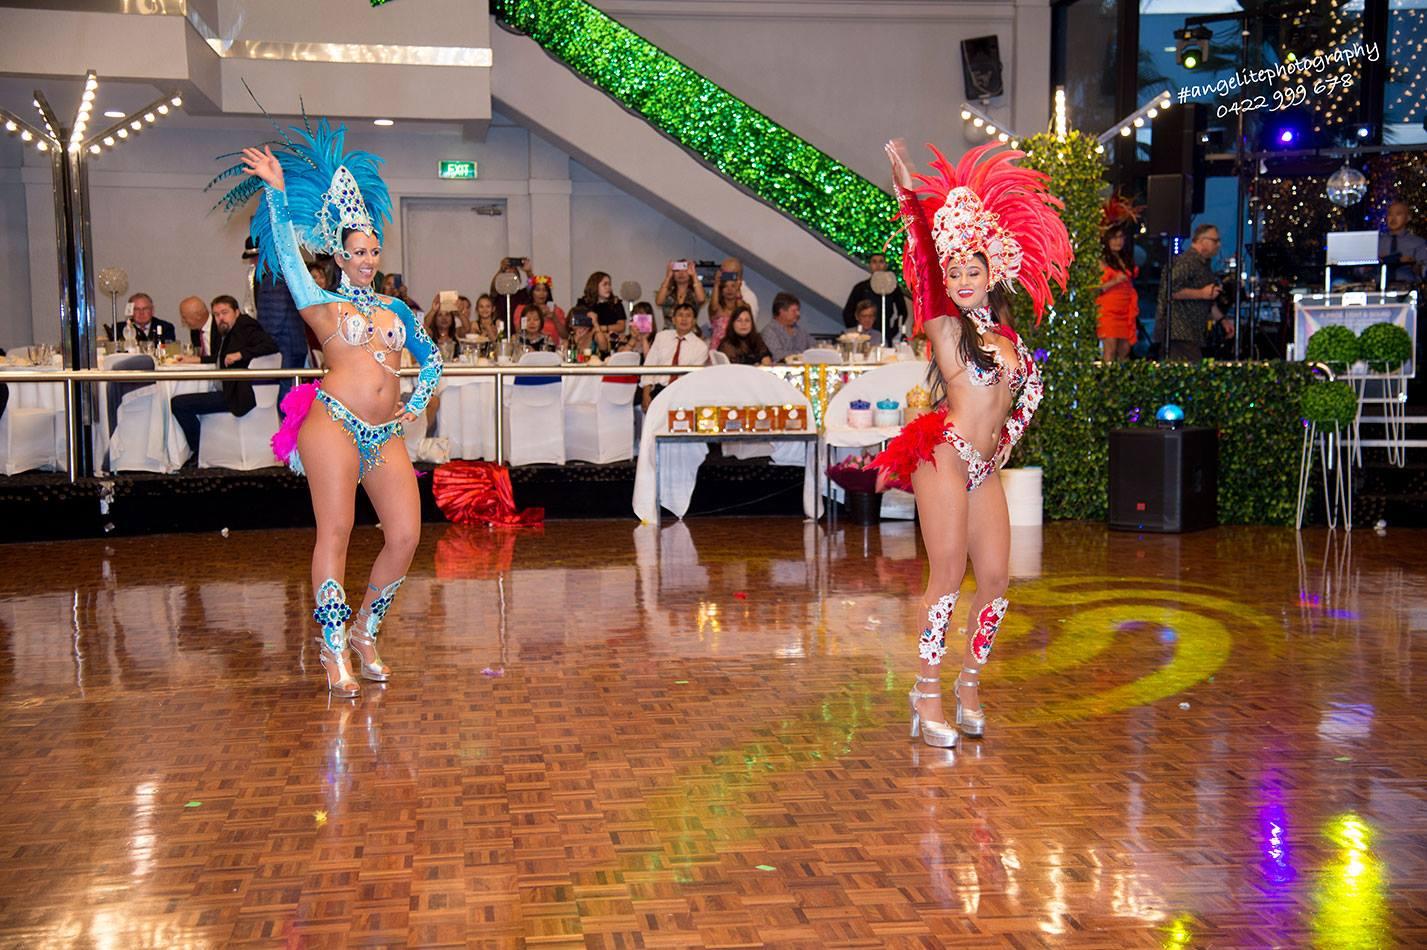 smad-share-me-a-dream-rio-2019-nonprofit-melbourne-dinner-dance-melbourne-australia-chrity-ball.jpg